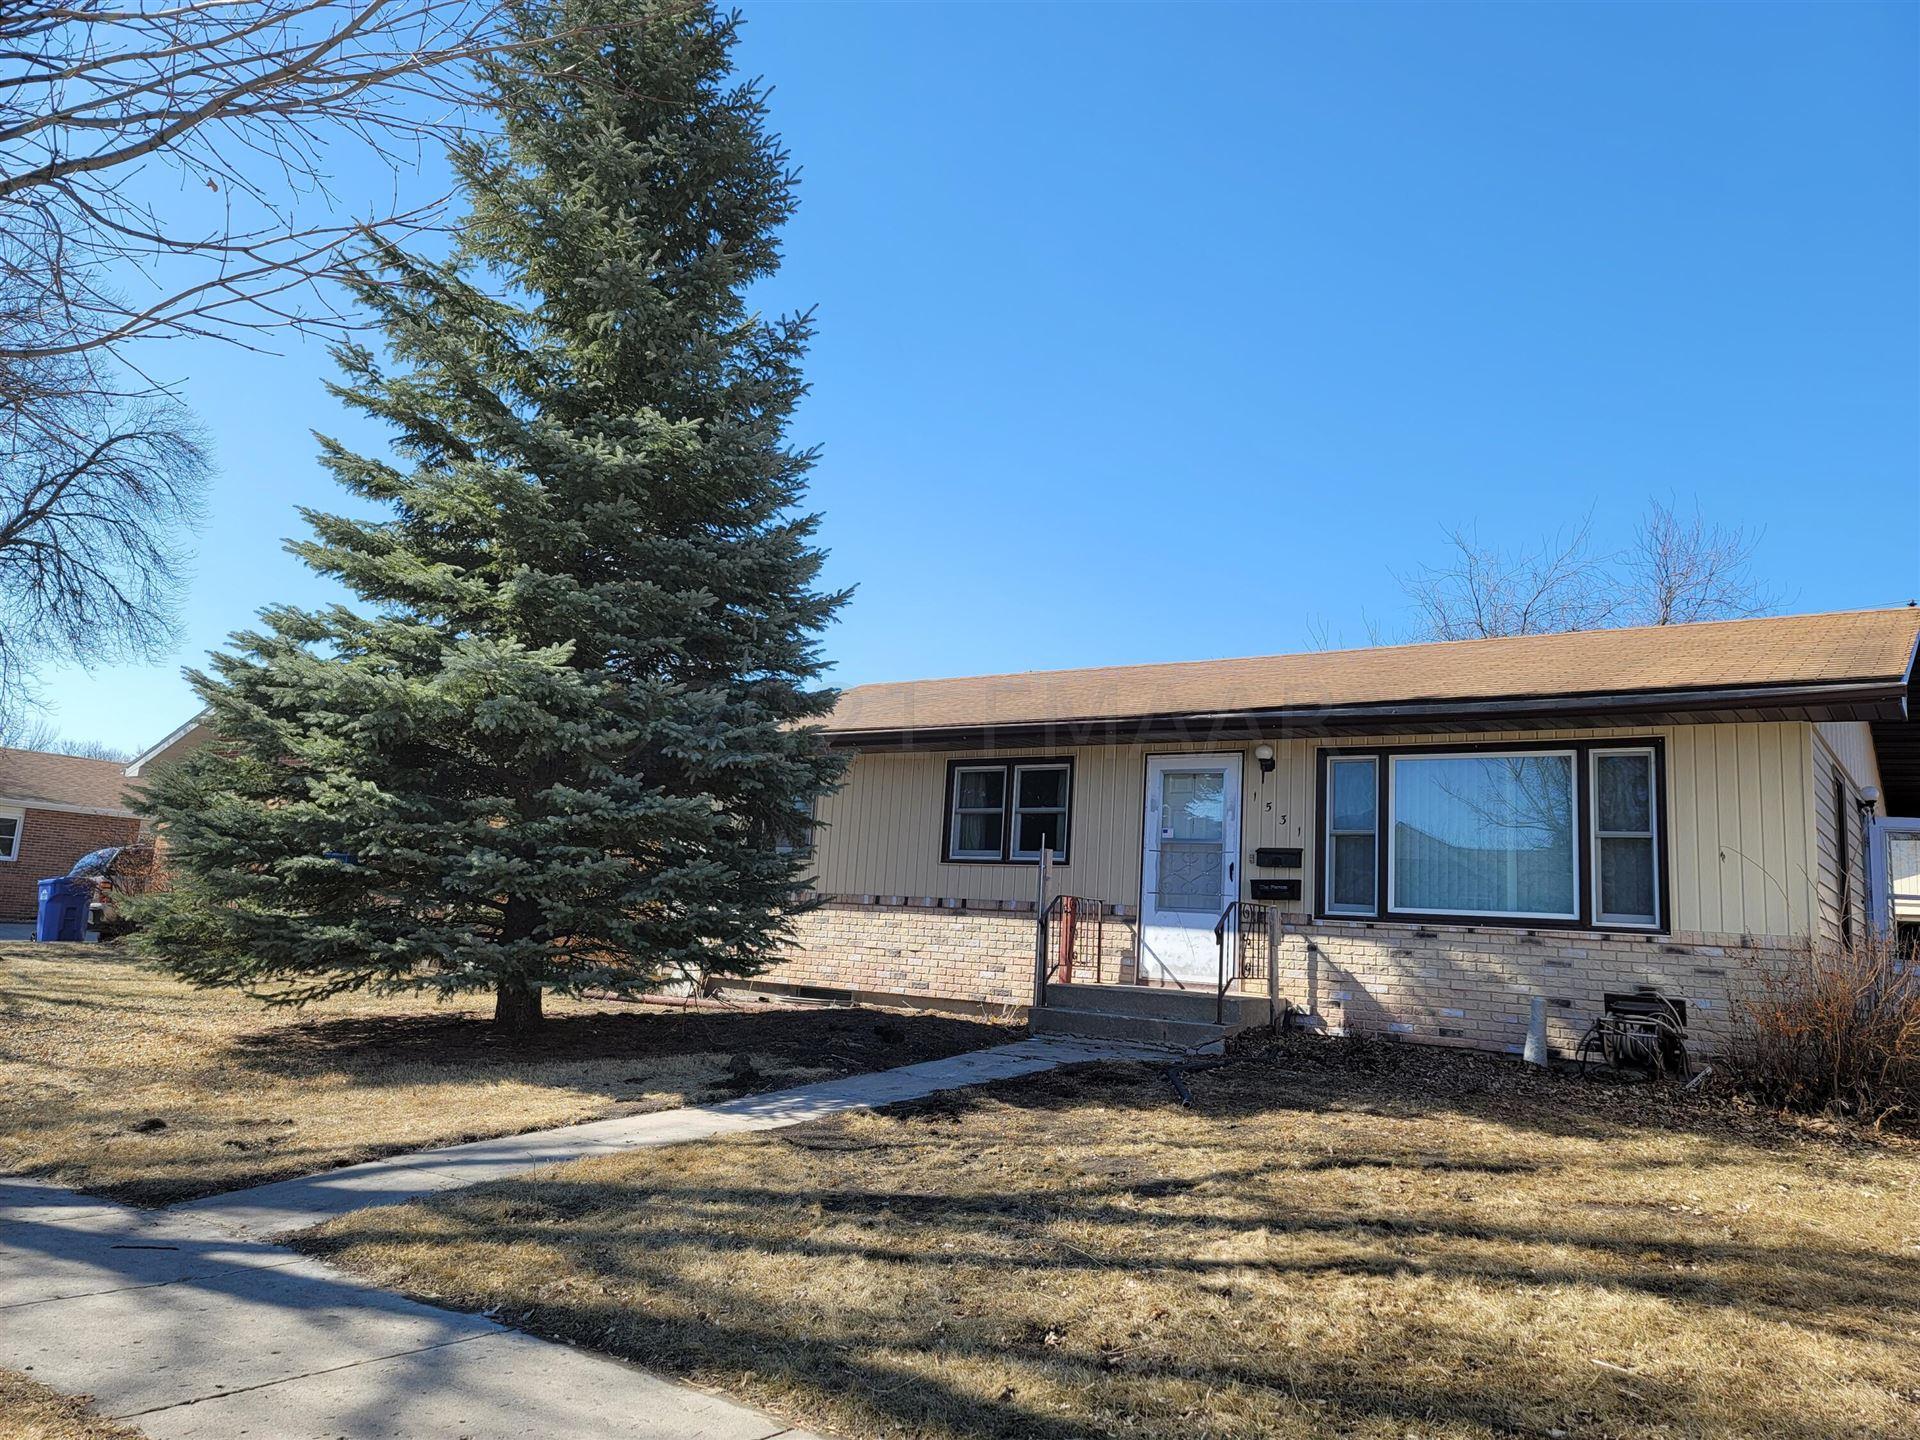 1531 16 1\/2 Street S, Fargo, ND 58103 - #: 21-1273